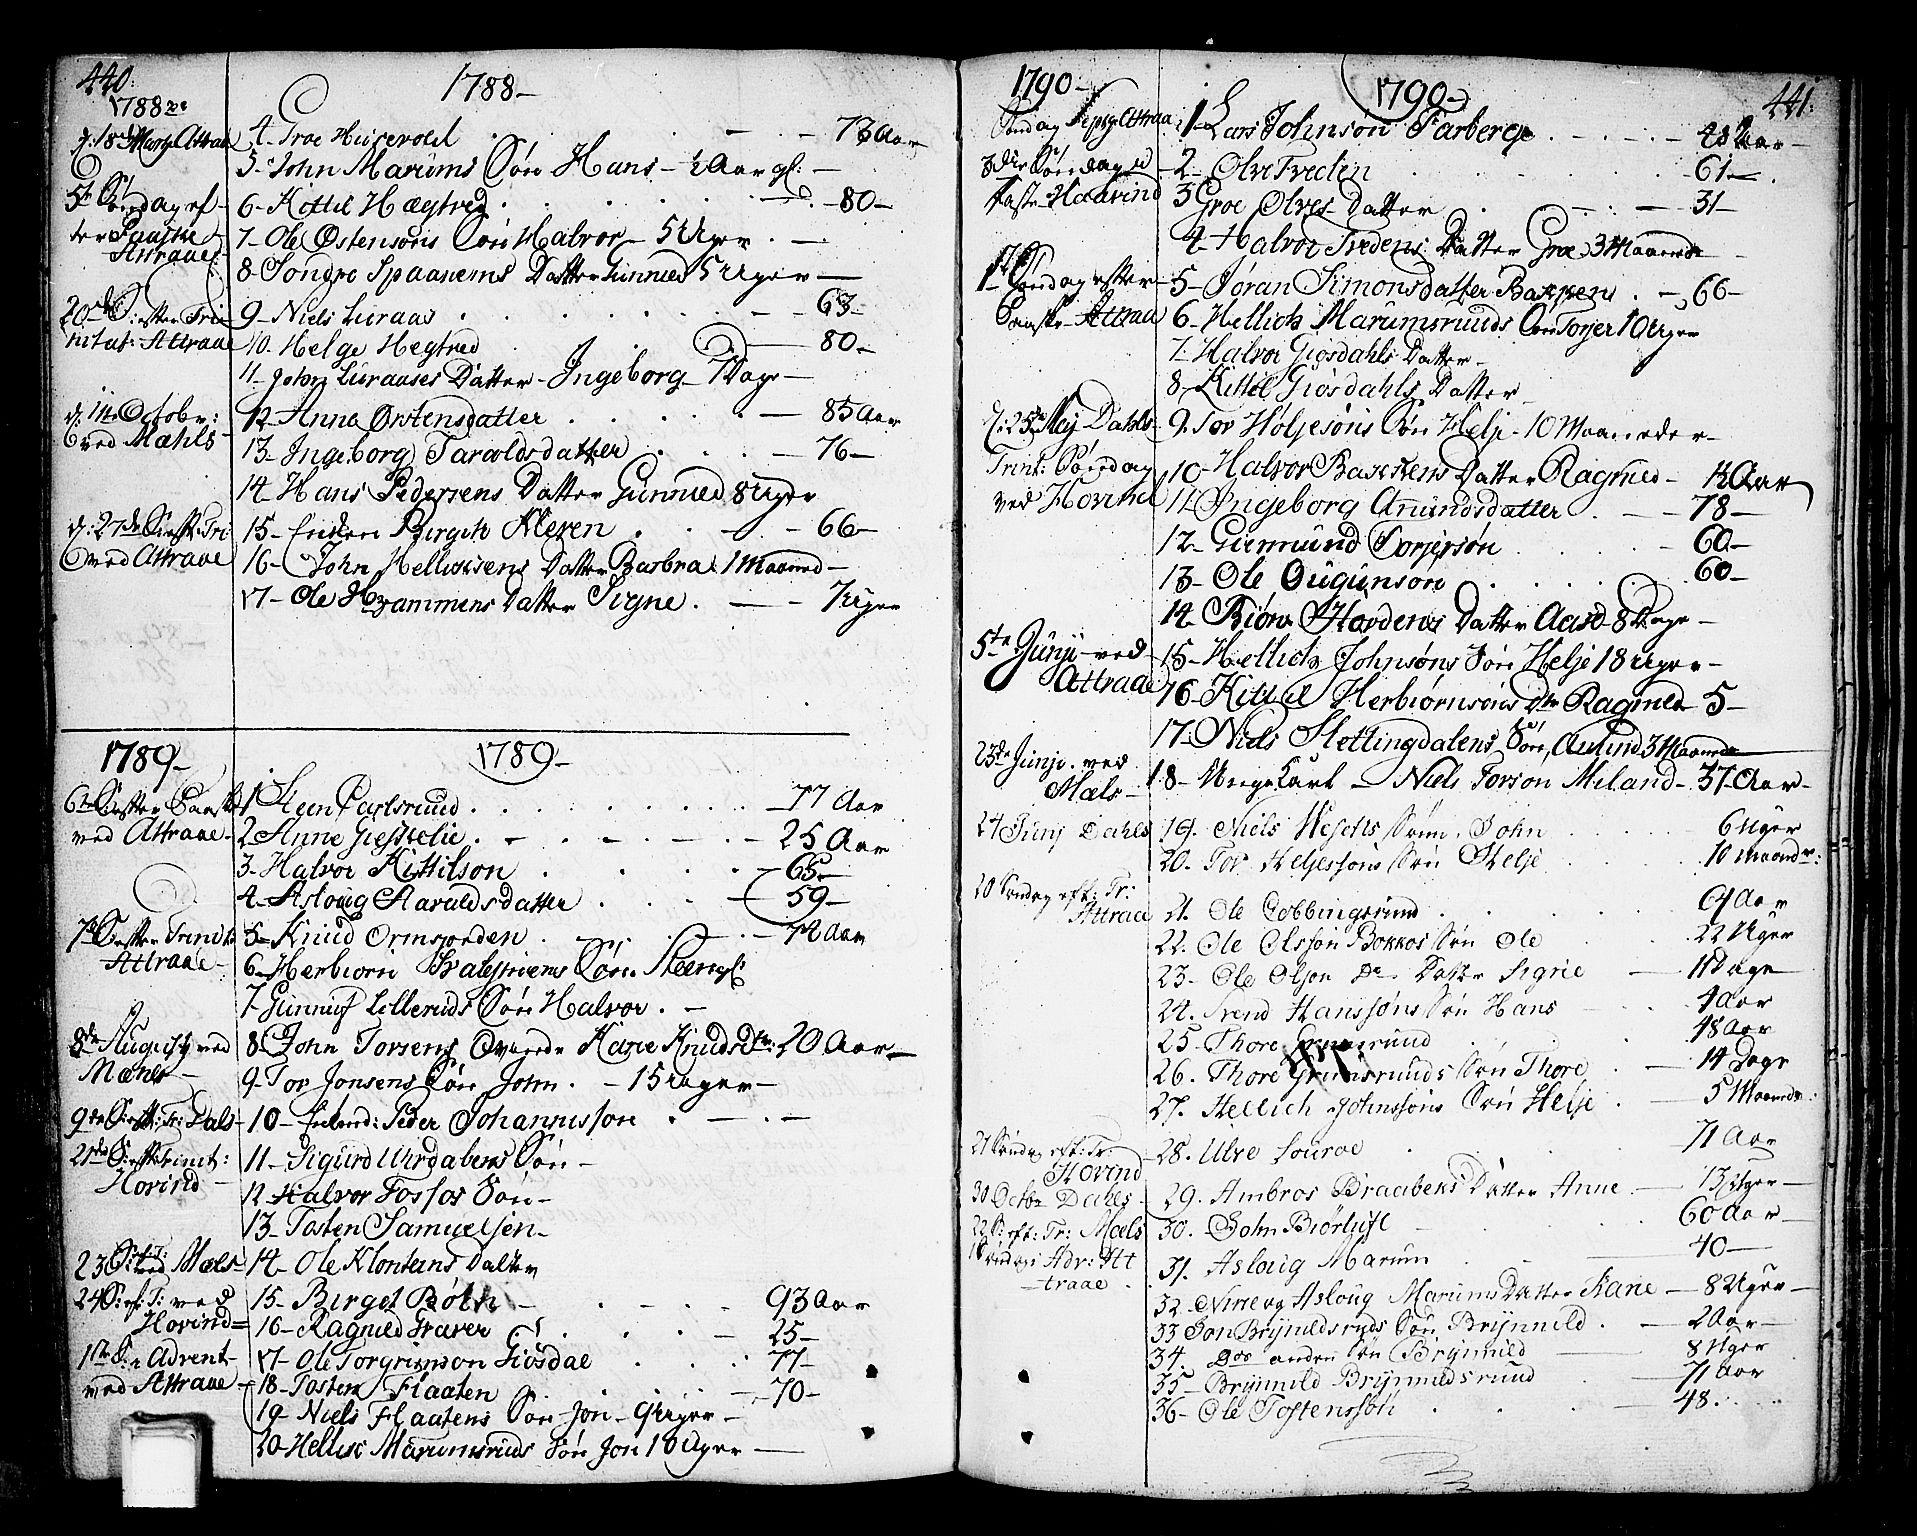 SAKO, Tinn kirkebøker, F/Fa/L0002: Ministerialbok nr. I 2, 1757-1810, s. 440-441